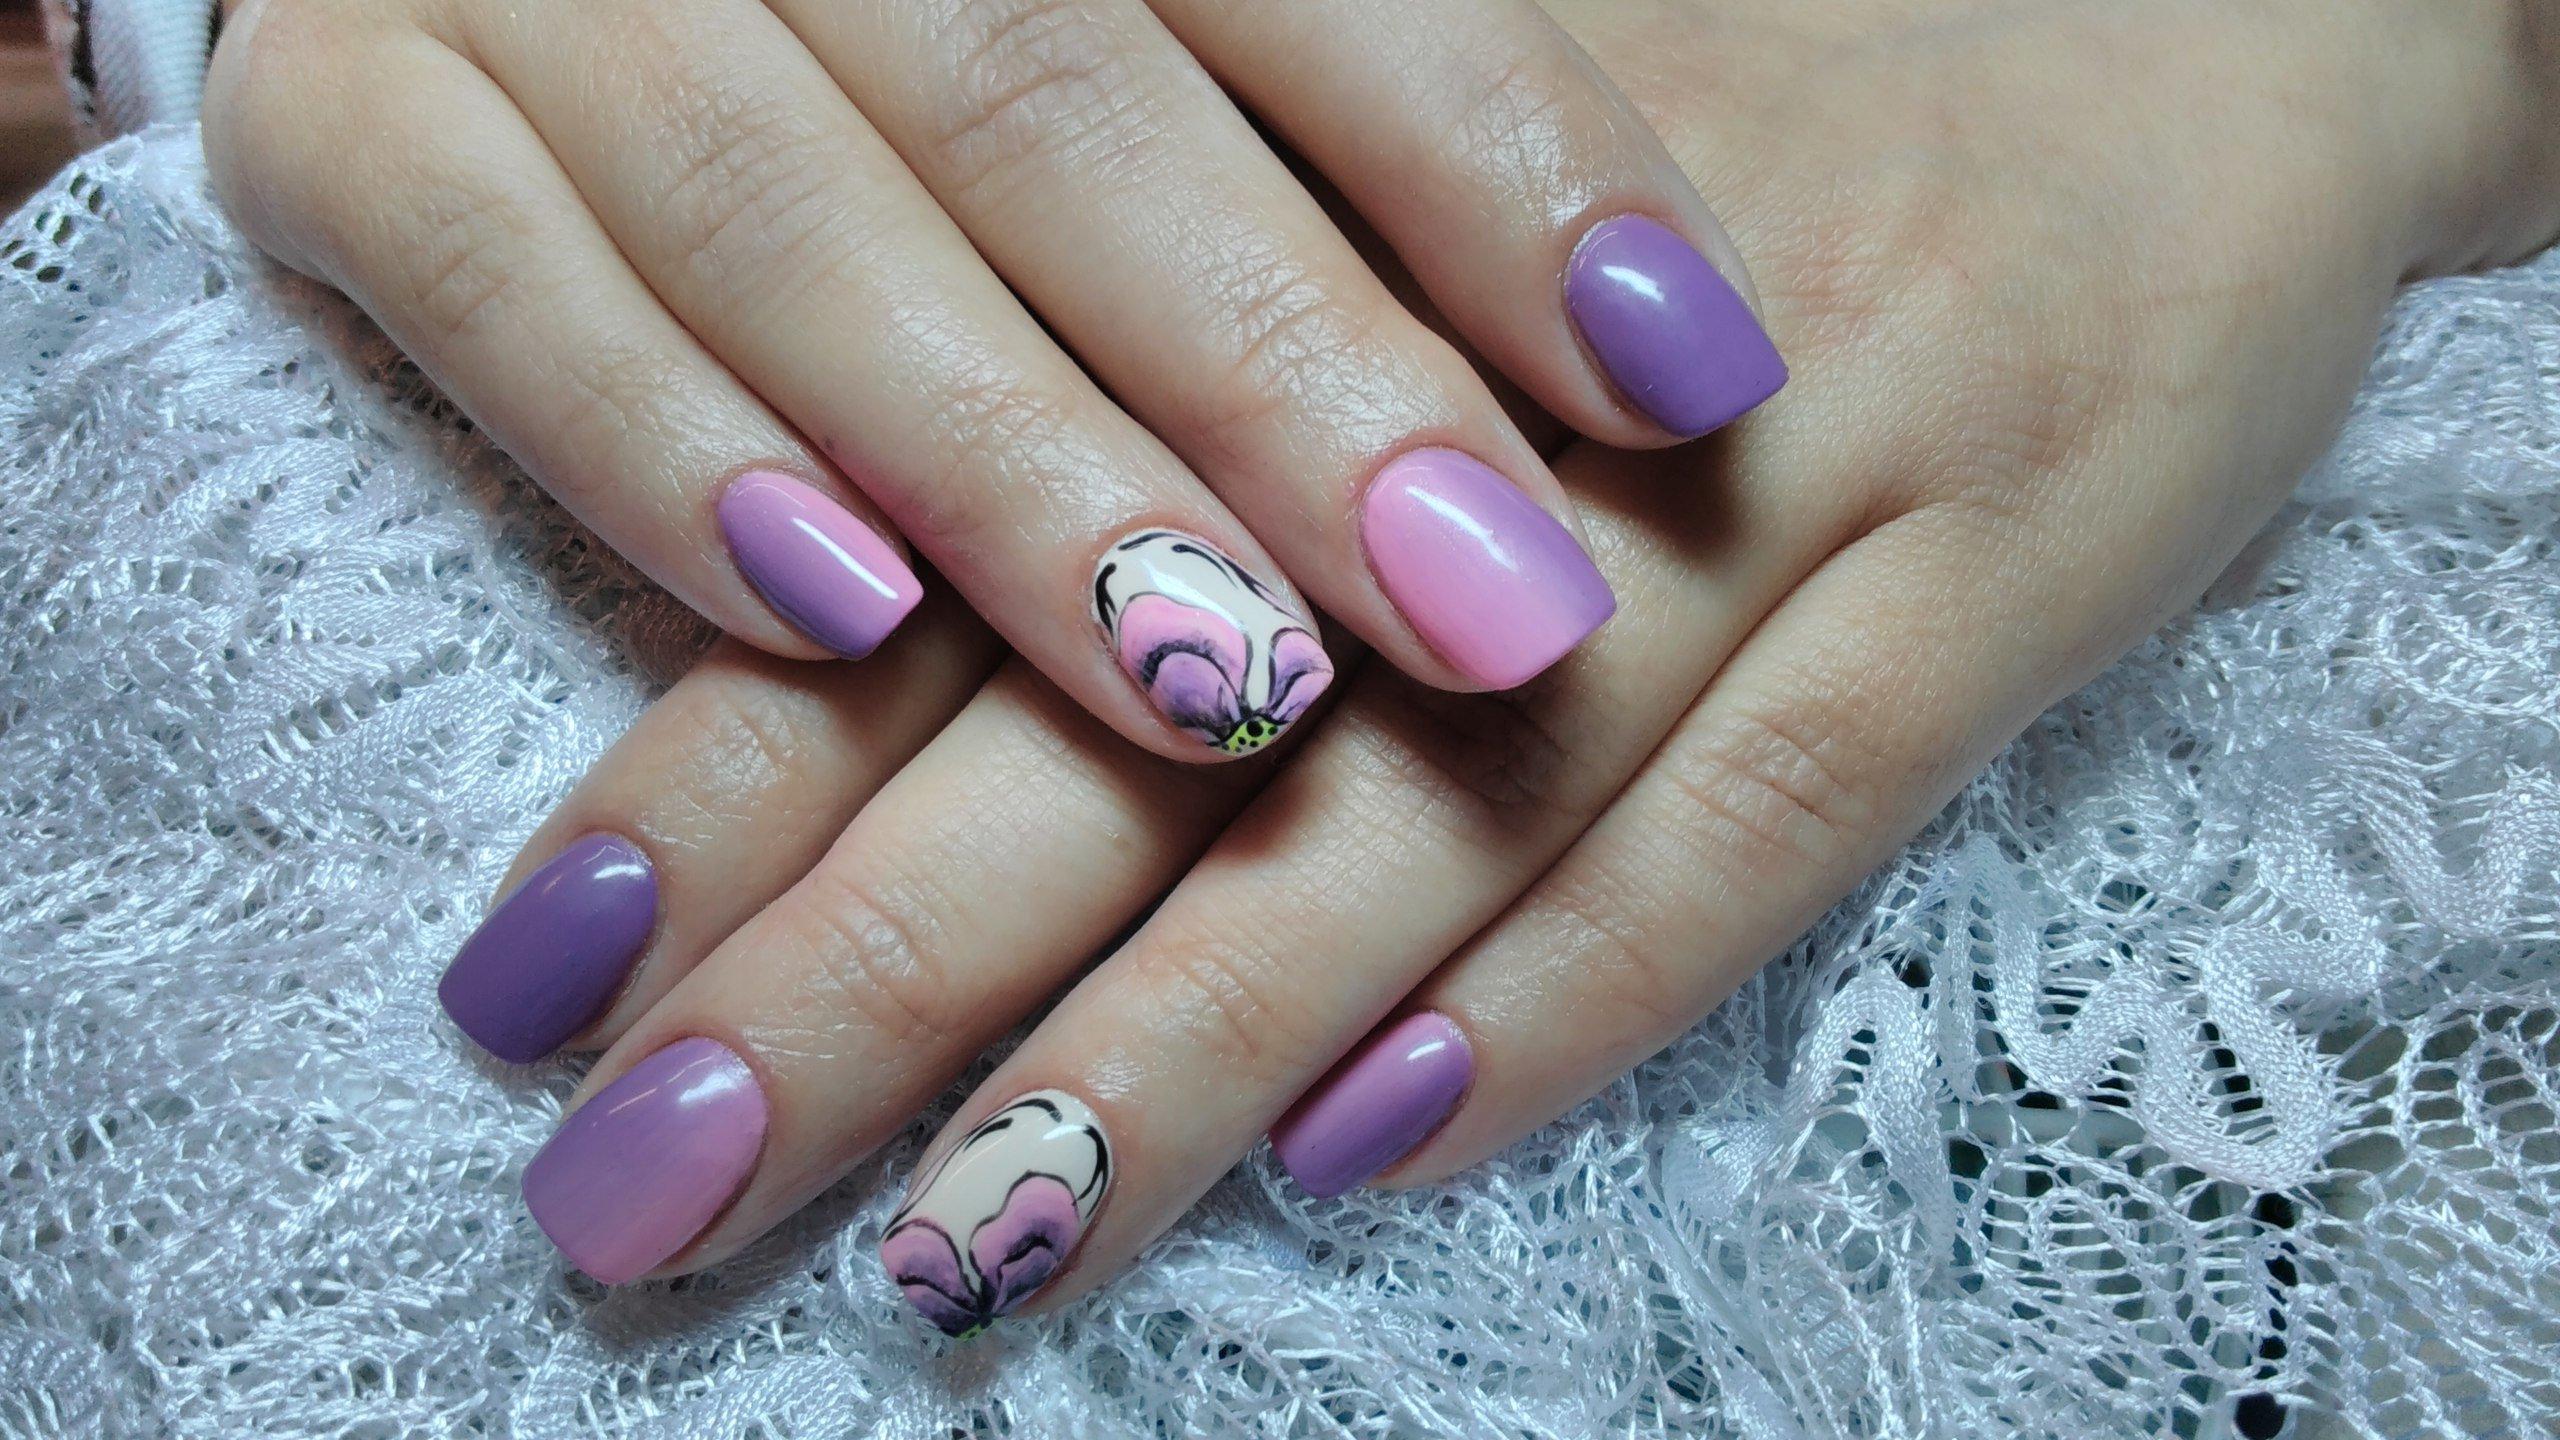 sirenevyj-manikyur-foto_30 Фиолетовый маникюр 2019-2020, фиолетовый дизайн ногтей, маникюр фиолетового цвета